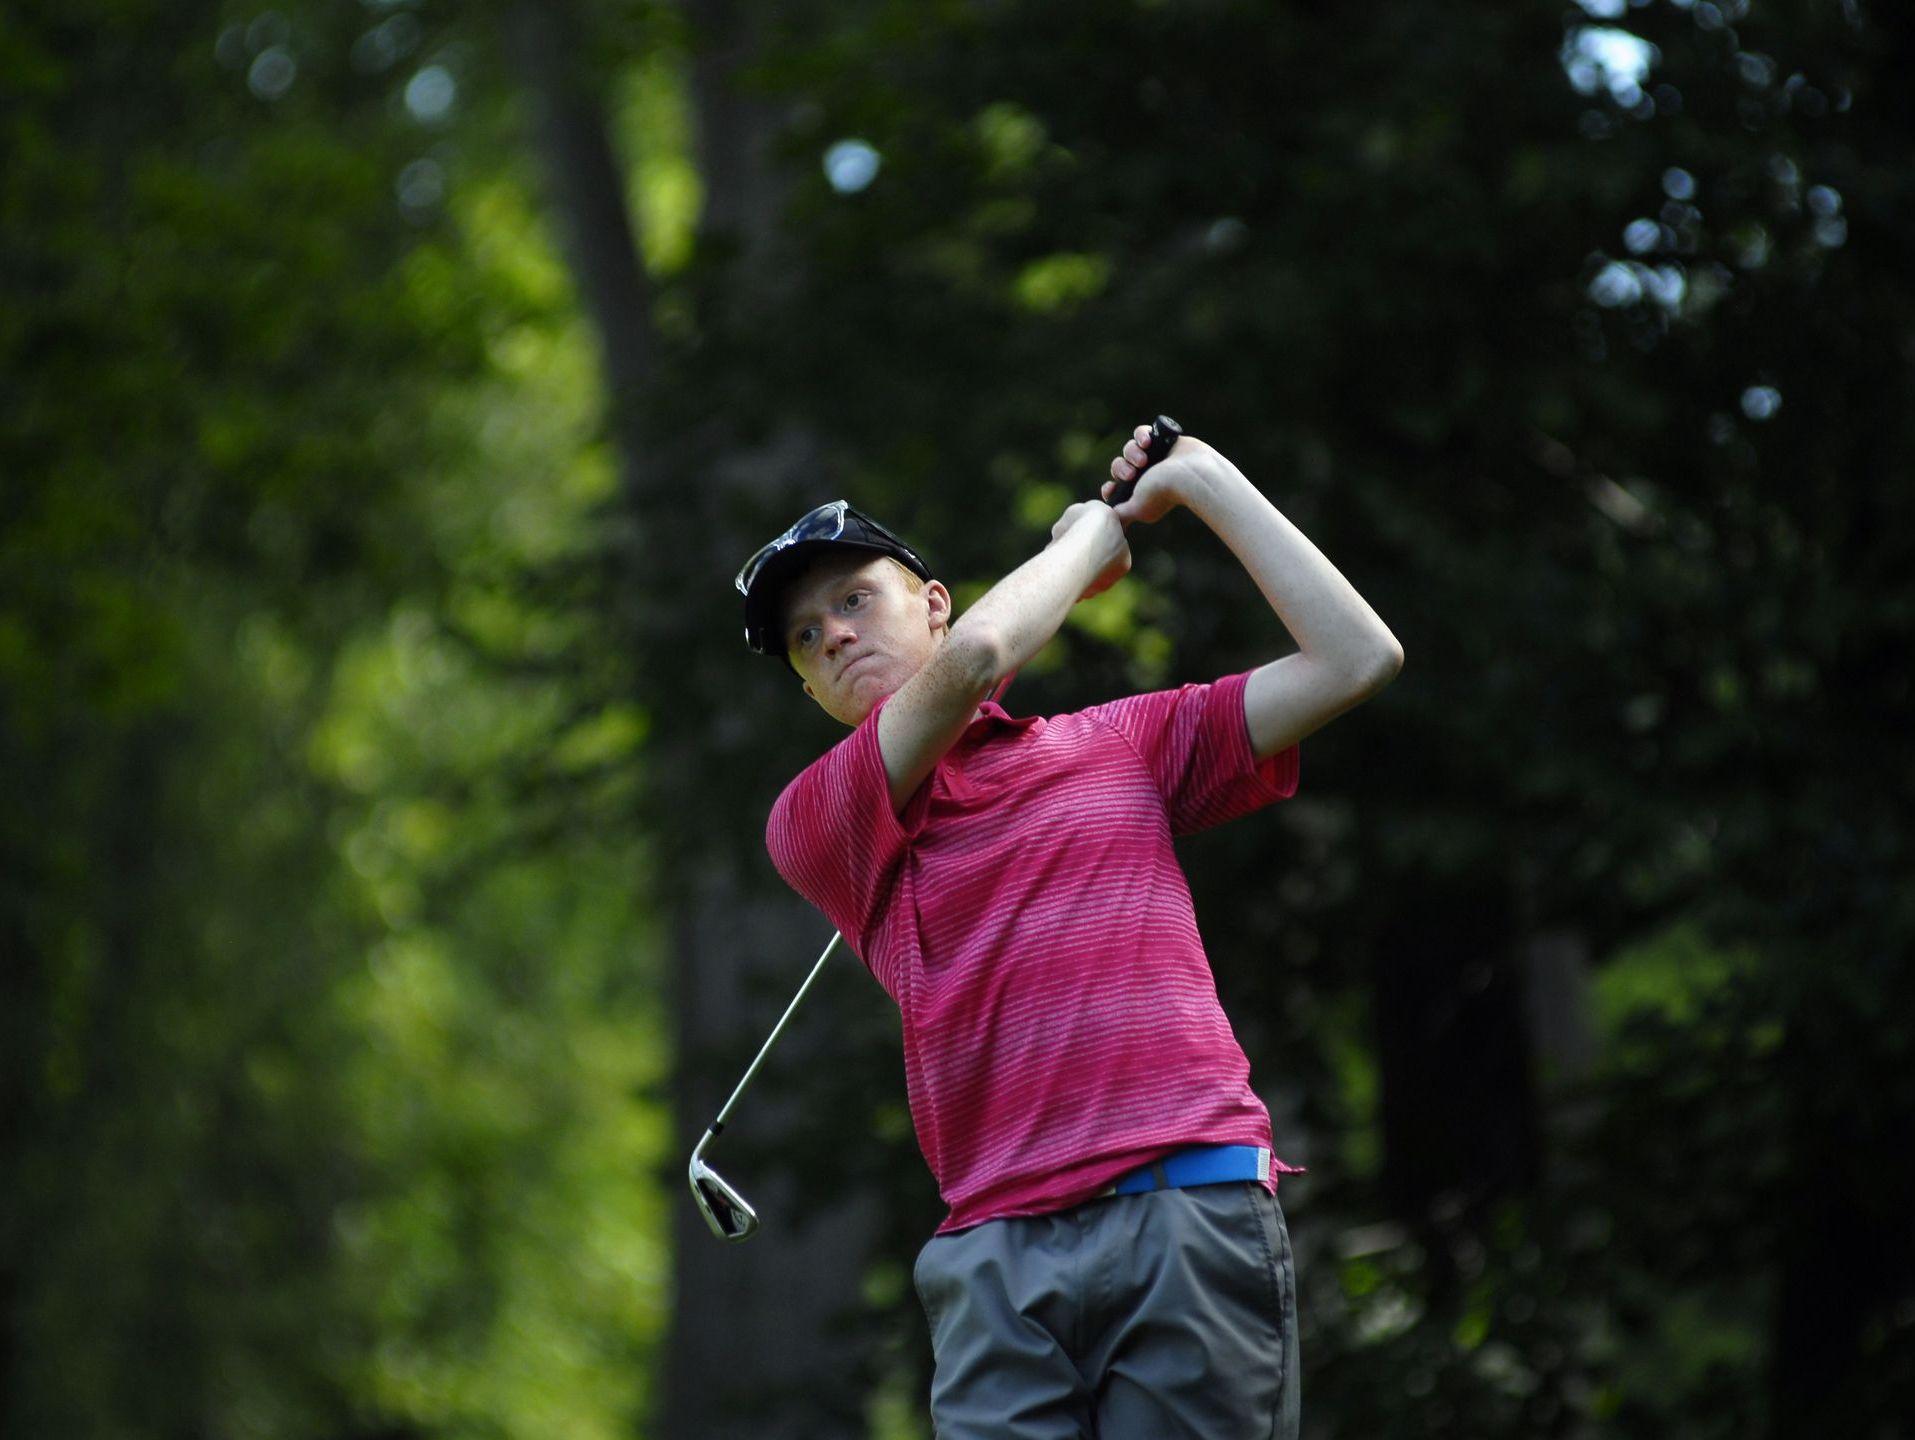 Matt Benson of Lexington, hits a tee shot Monday, Aug 3, during the Blue Water Water Junior Golf Association Tournament of Champions at The Port Huron Elks Golf Club.